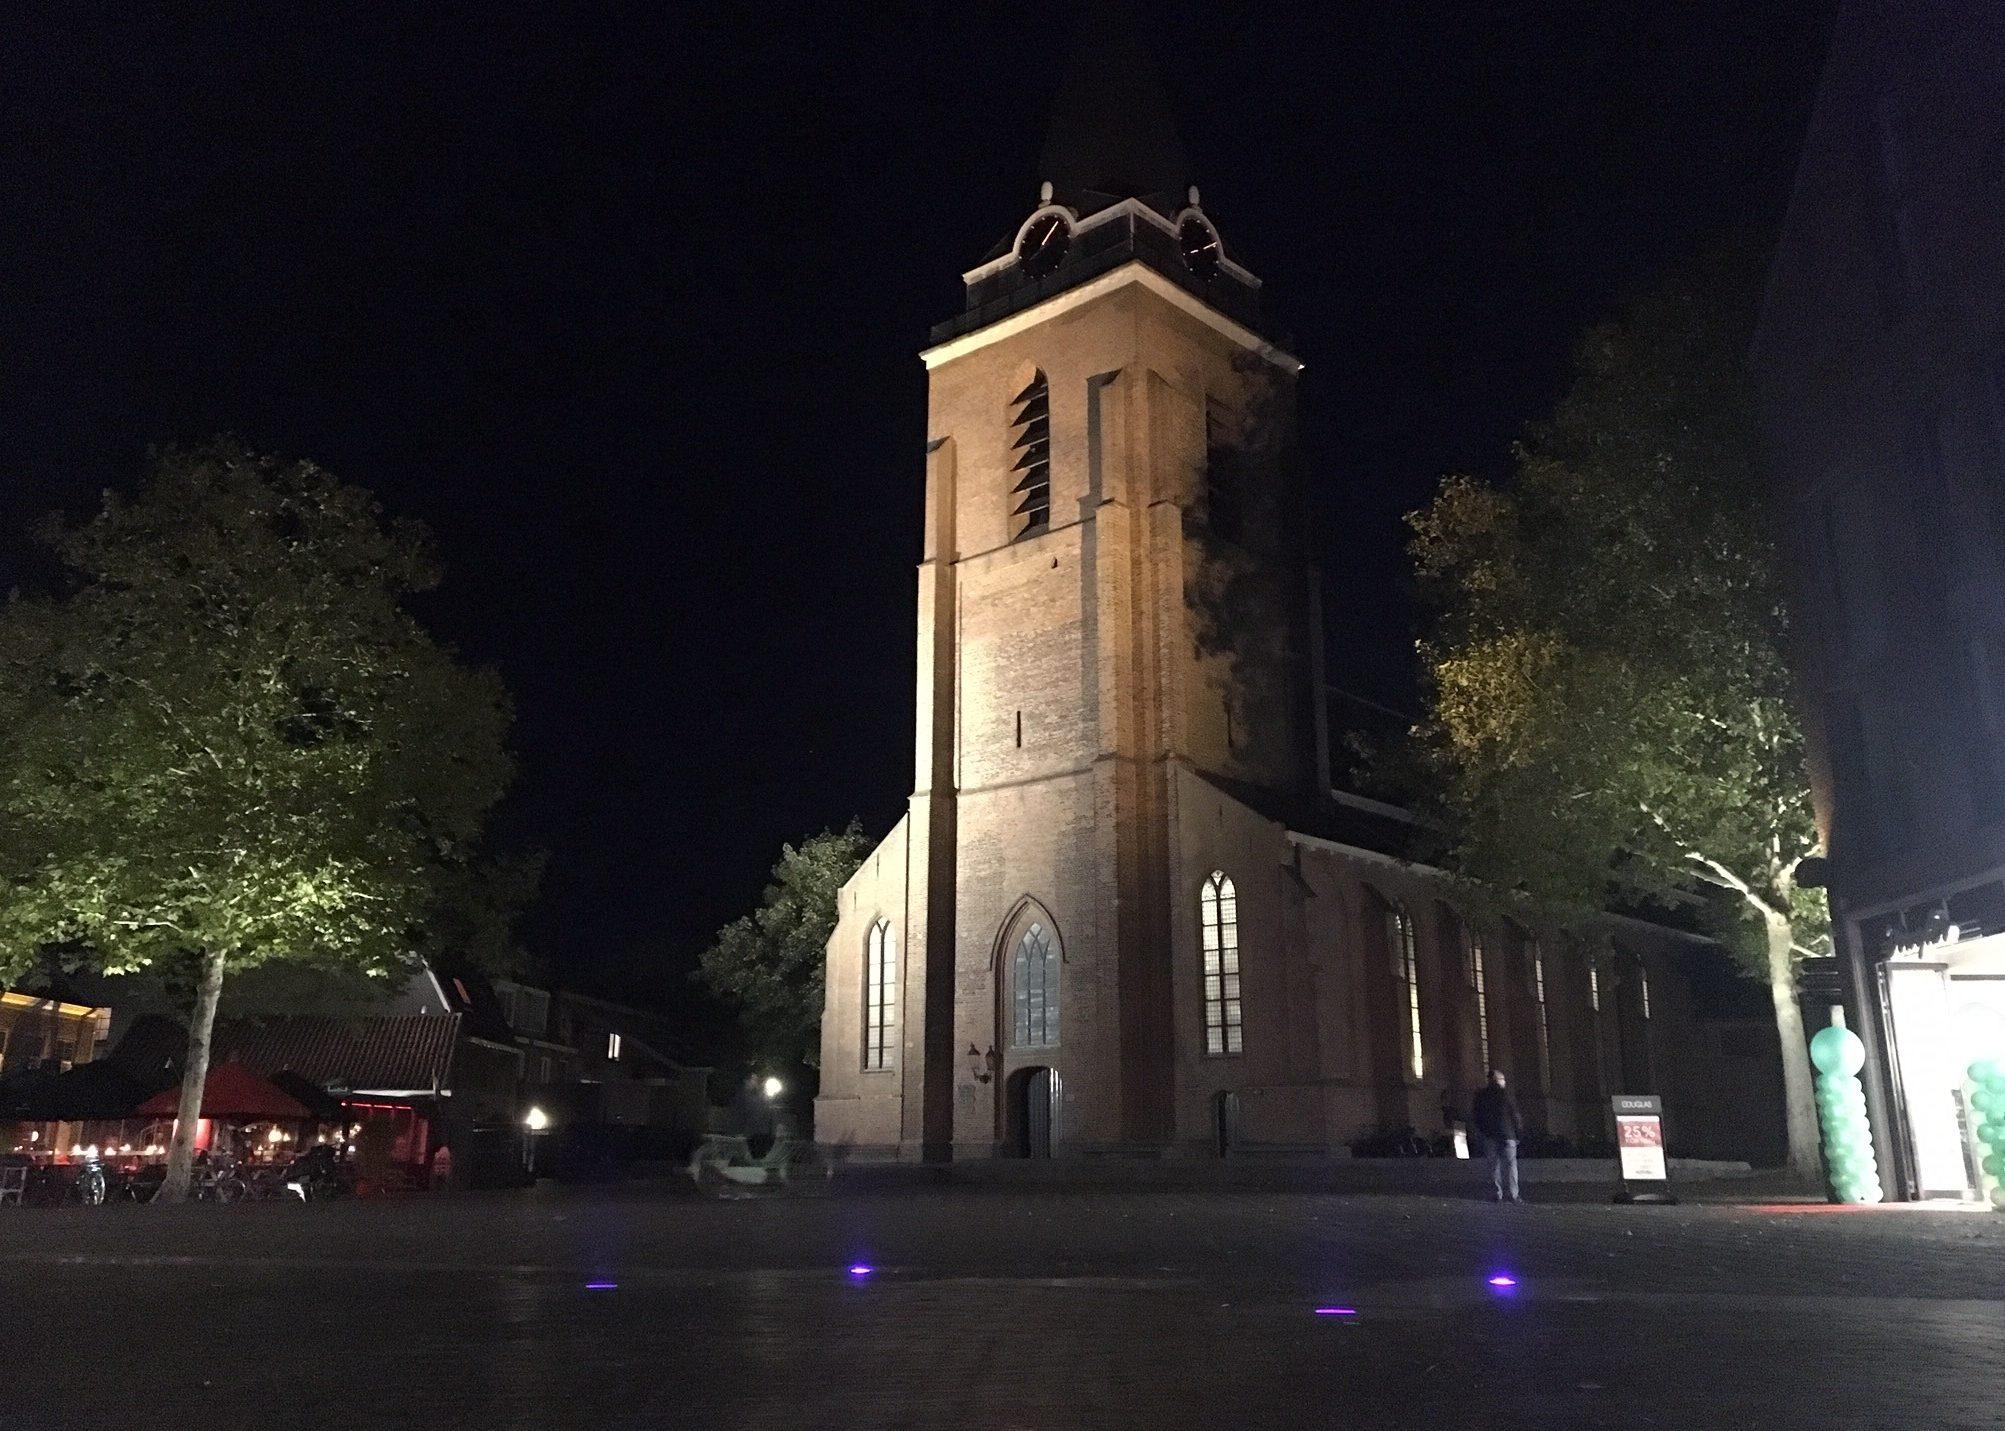 Blauwe lampjes kerkplein petrustoren poort via principalis castellum